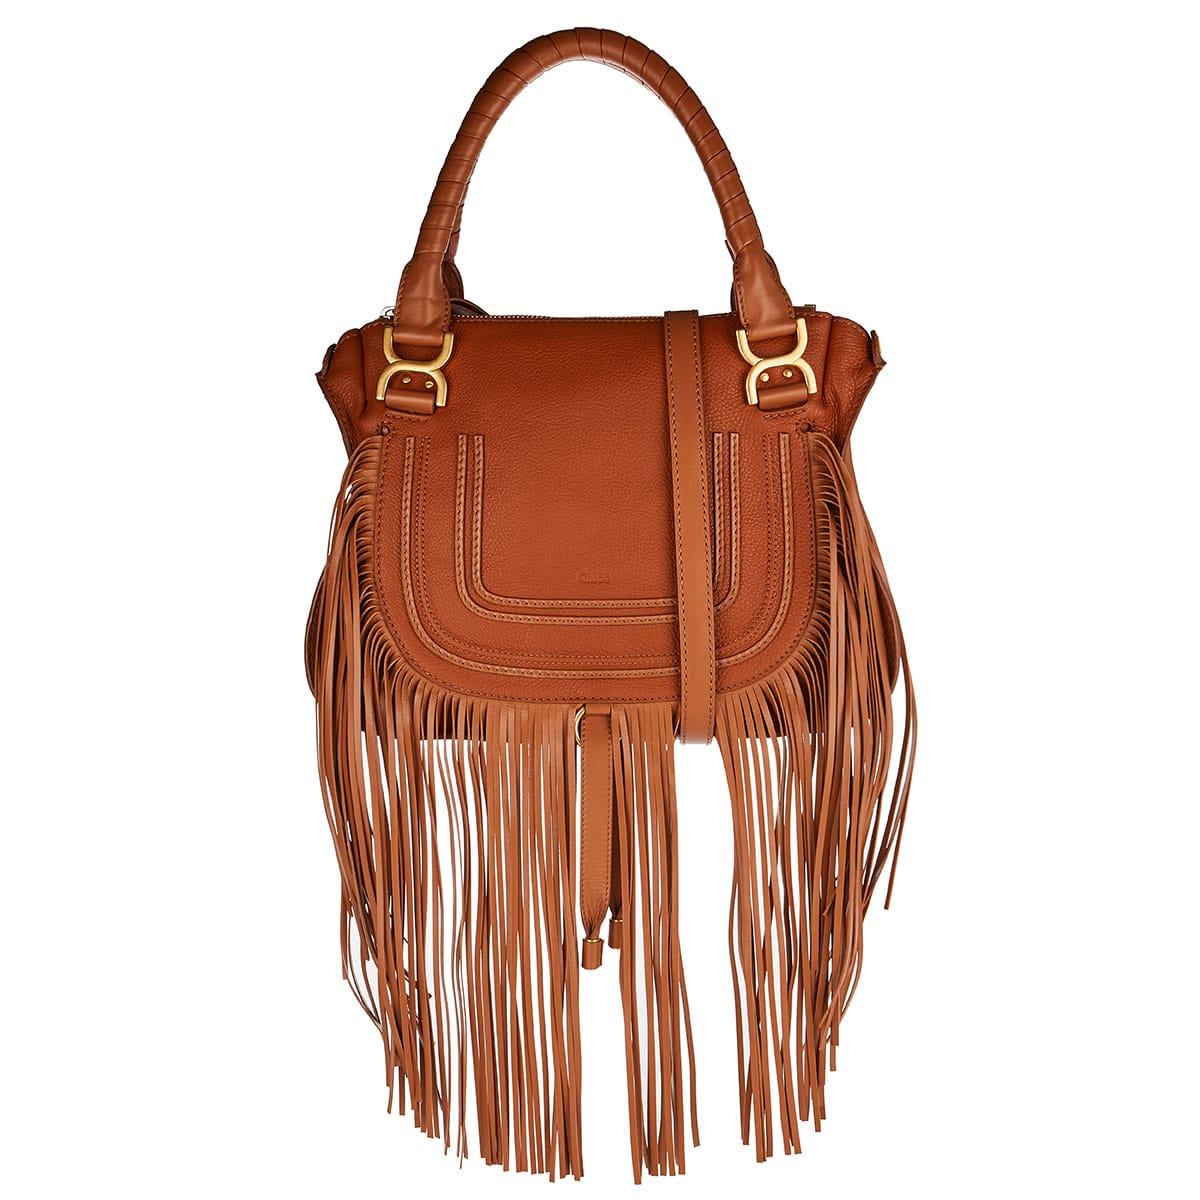 Marcie fringed leather bag